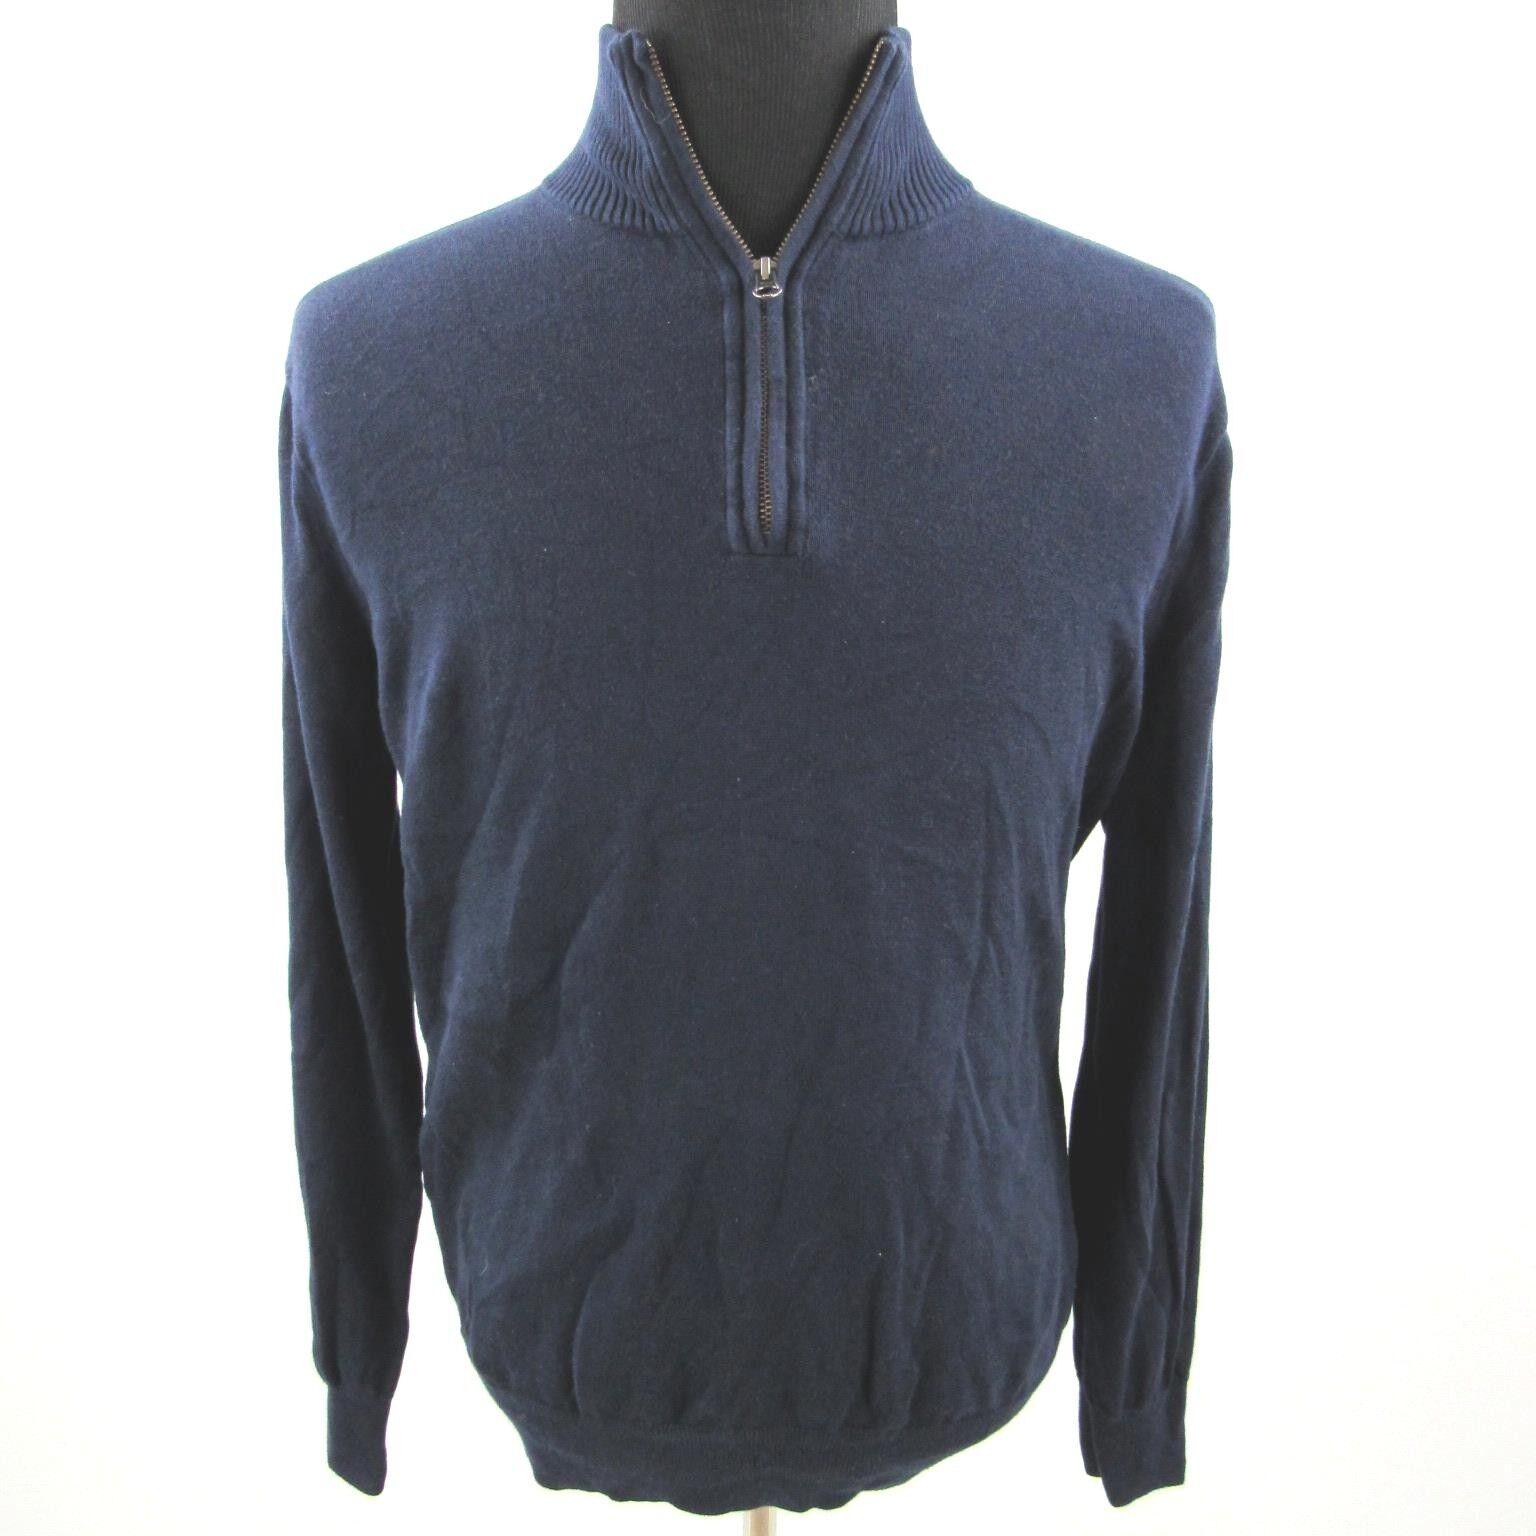 J Crew 1 2 Zip Sweater Mens Large bluee Cotton